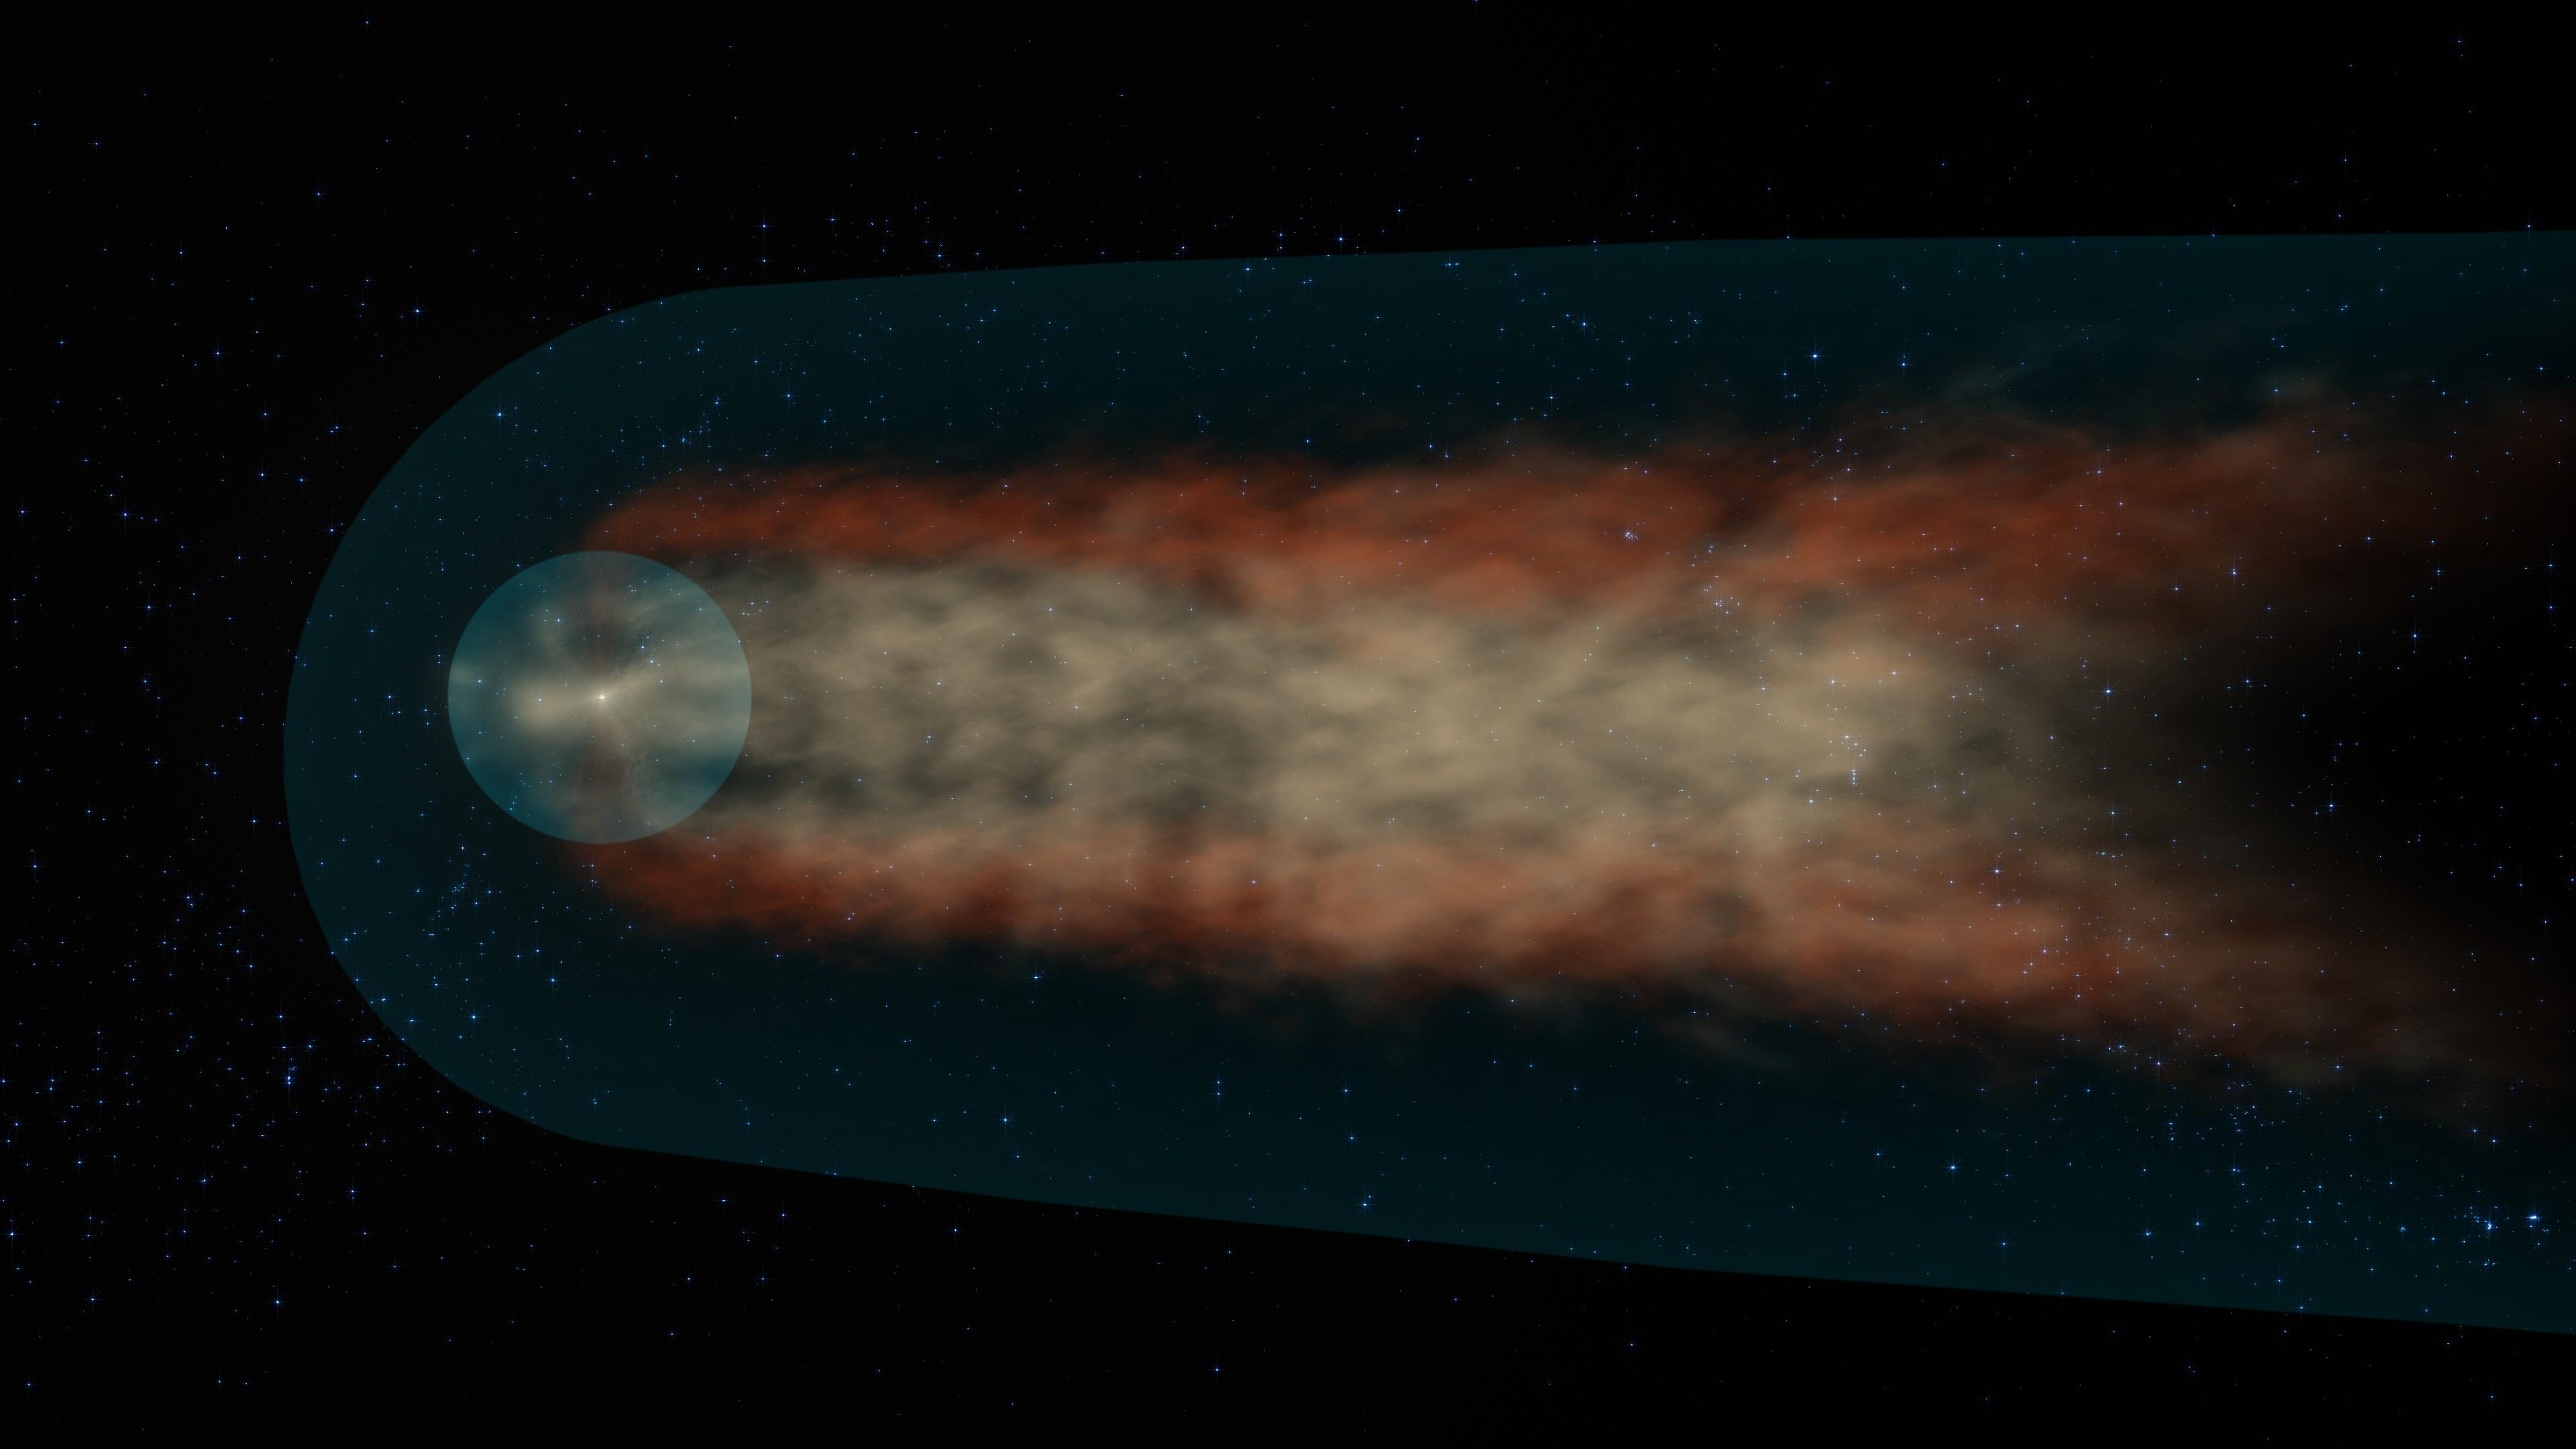 Para alguns cientistas, a heliosfera tem o formato de um cometa (Foto: NASA's Scientific Visualization Studio/Conceptual Imaging Lab)